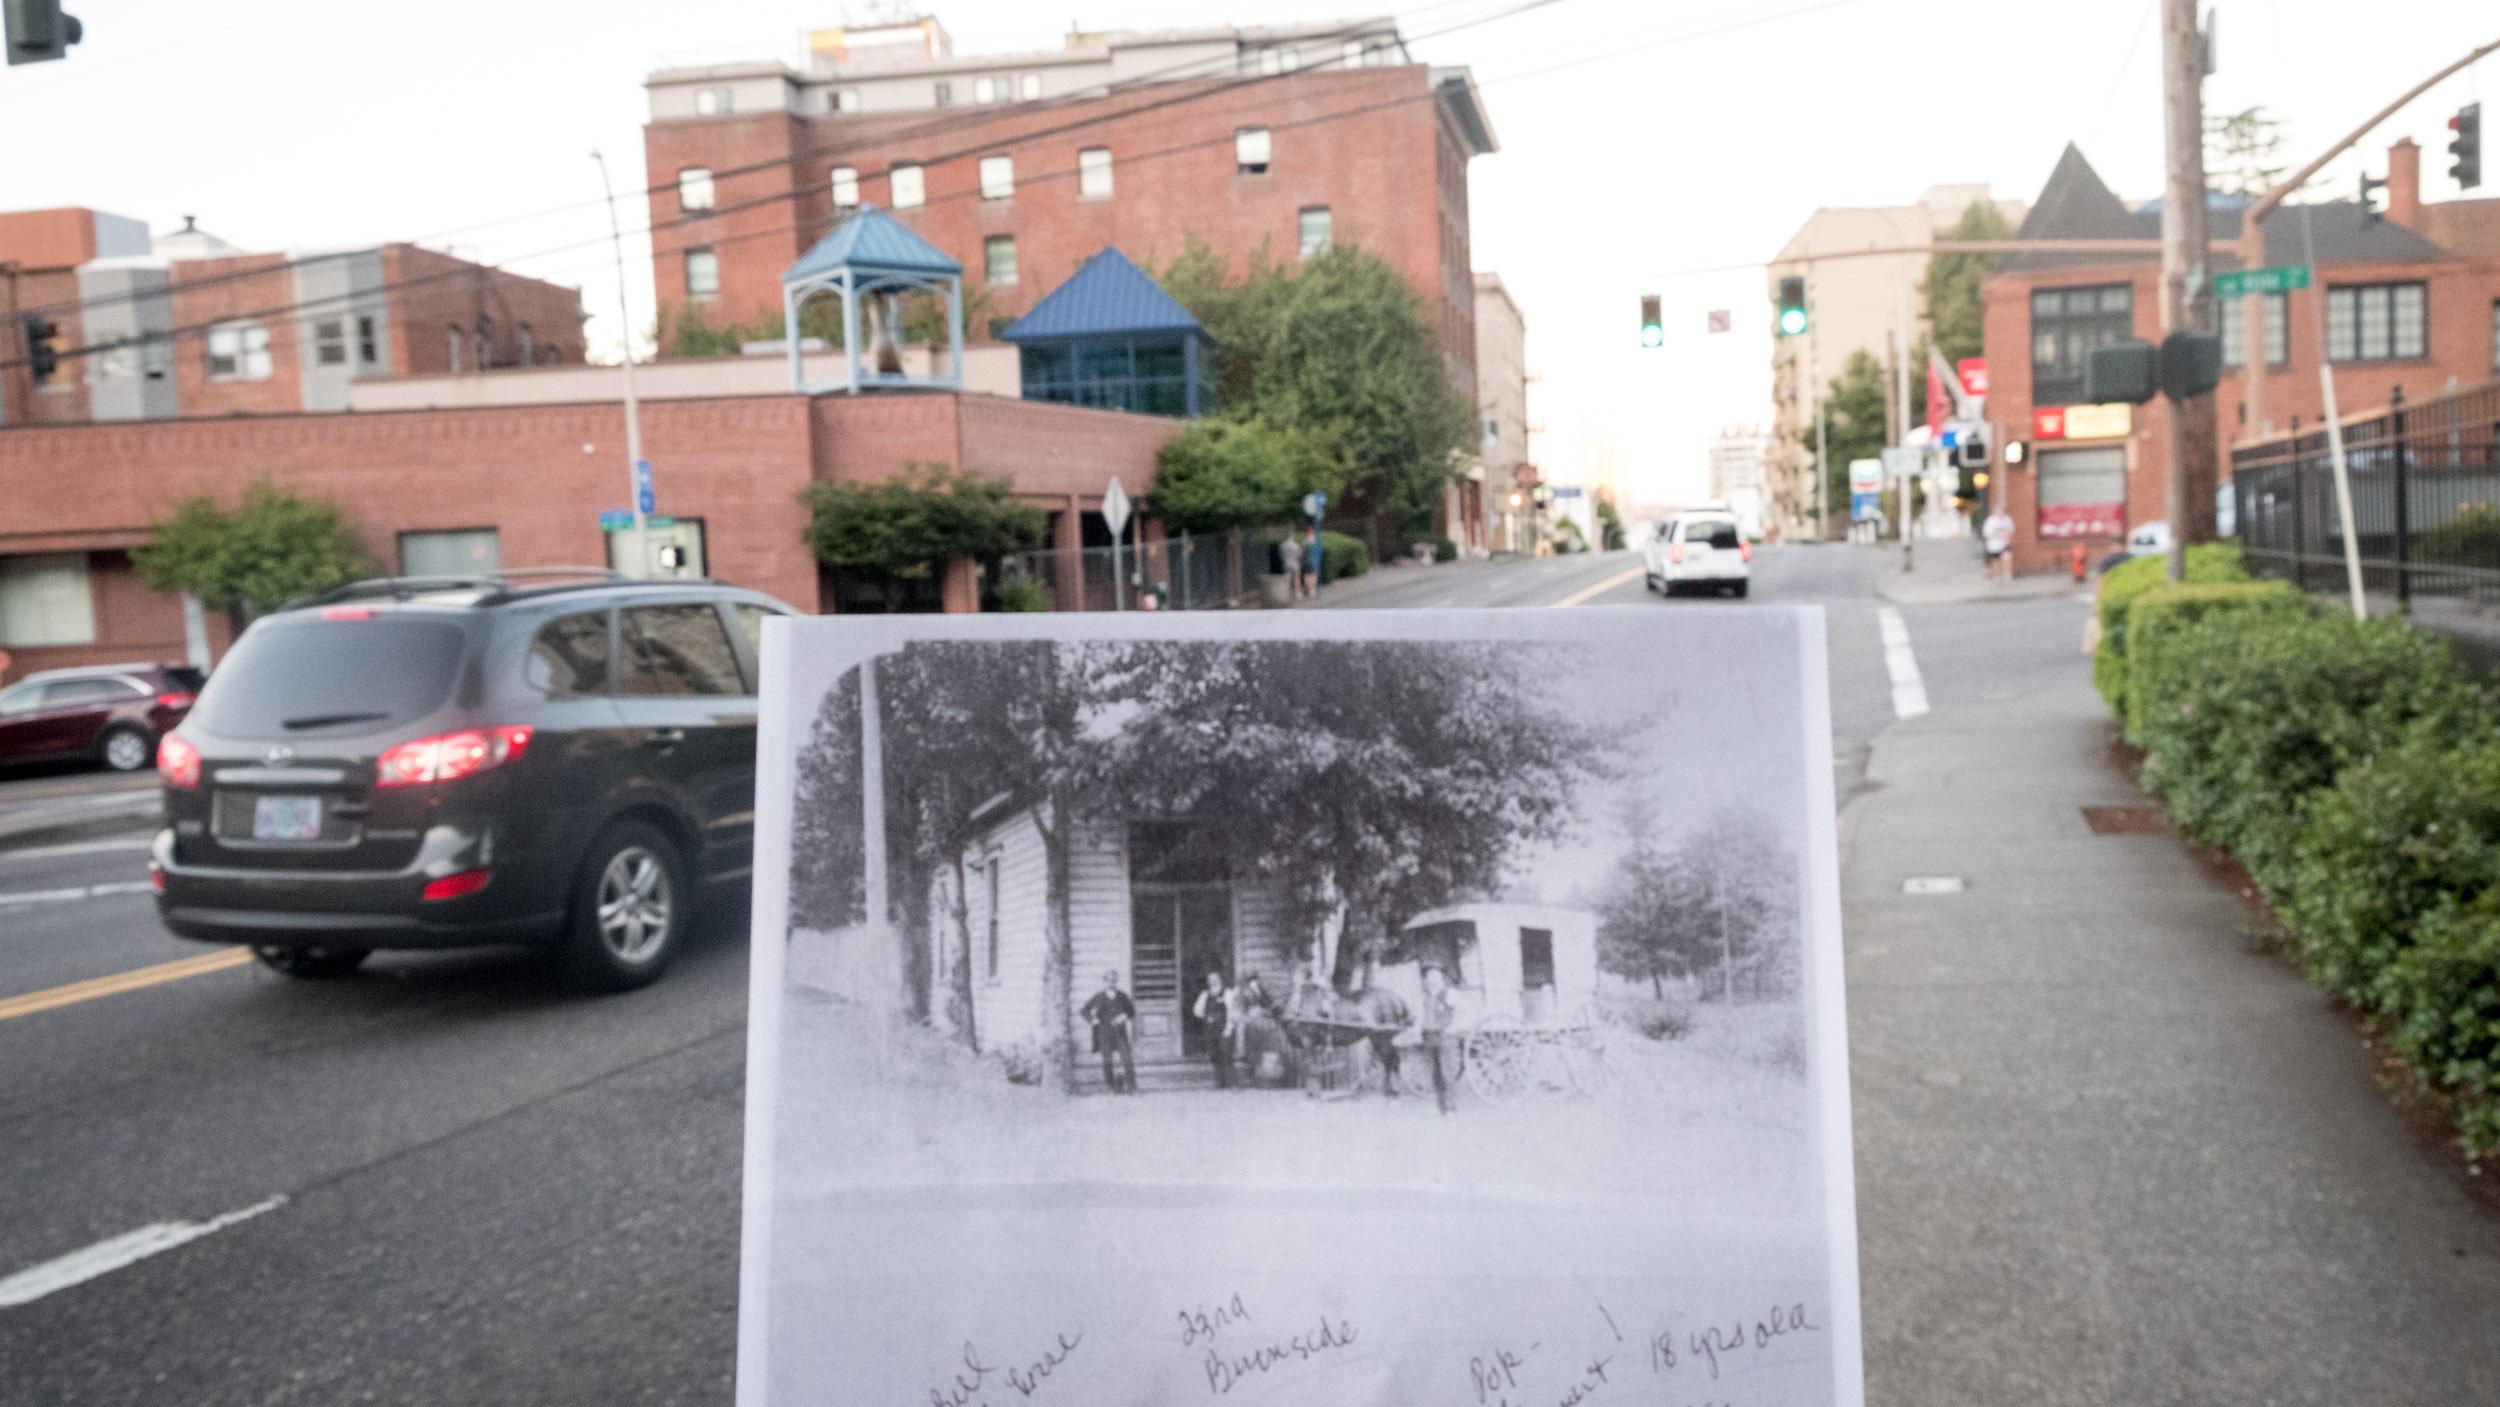 Portland NW 23rd and Burnside comparisons-8.jpg